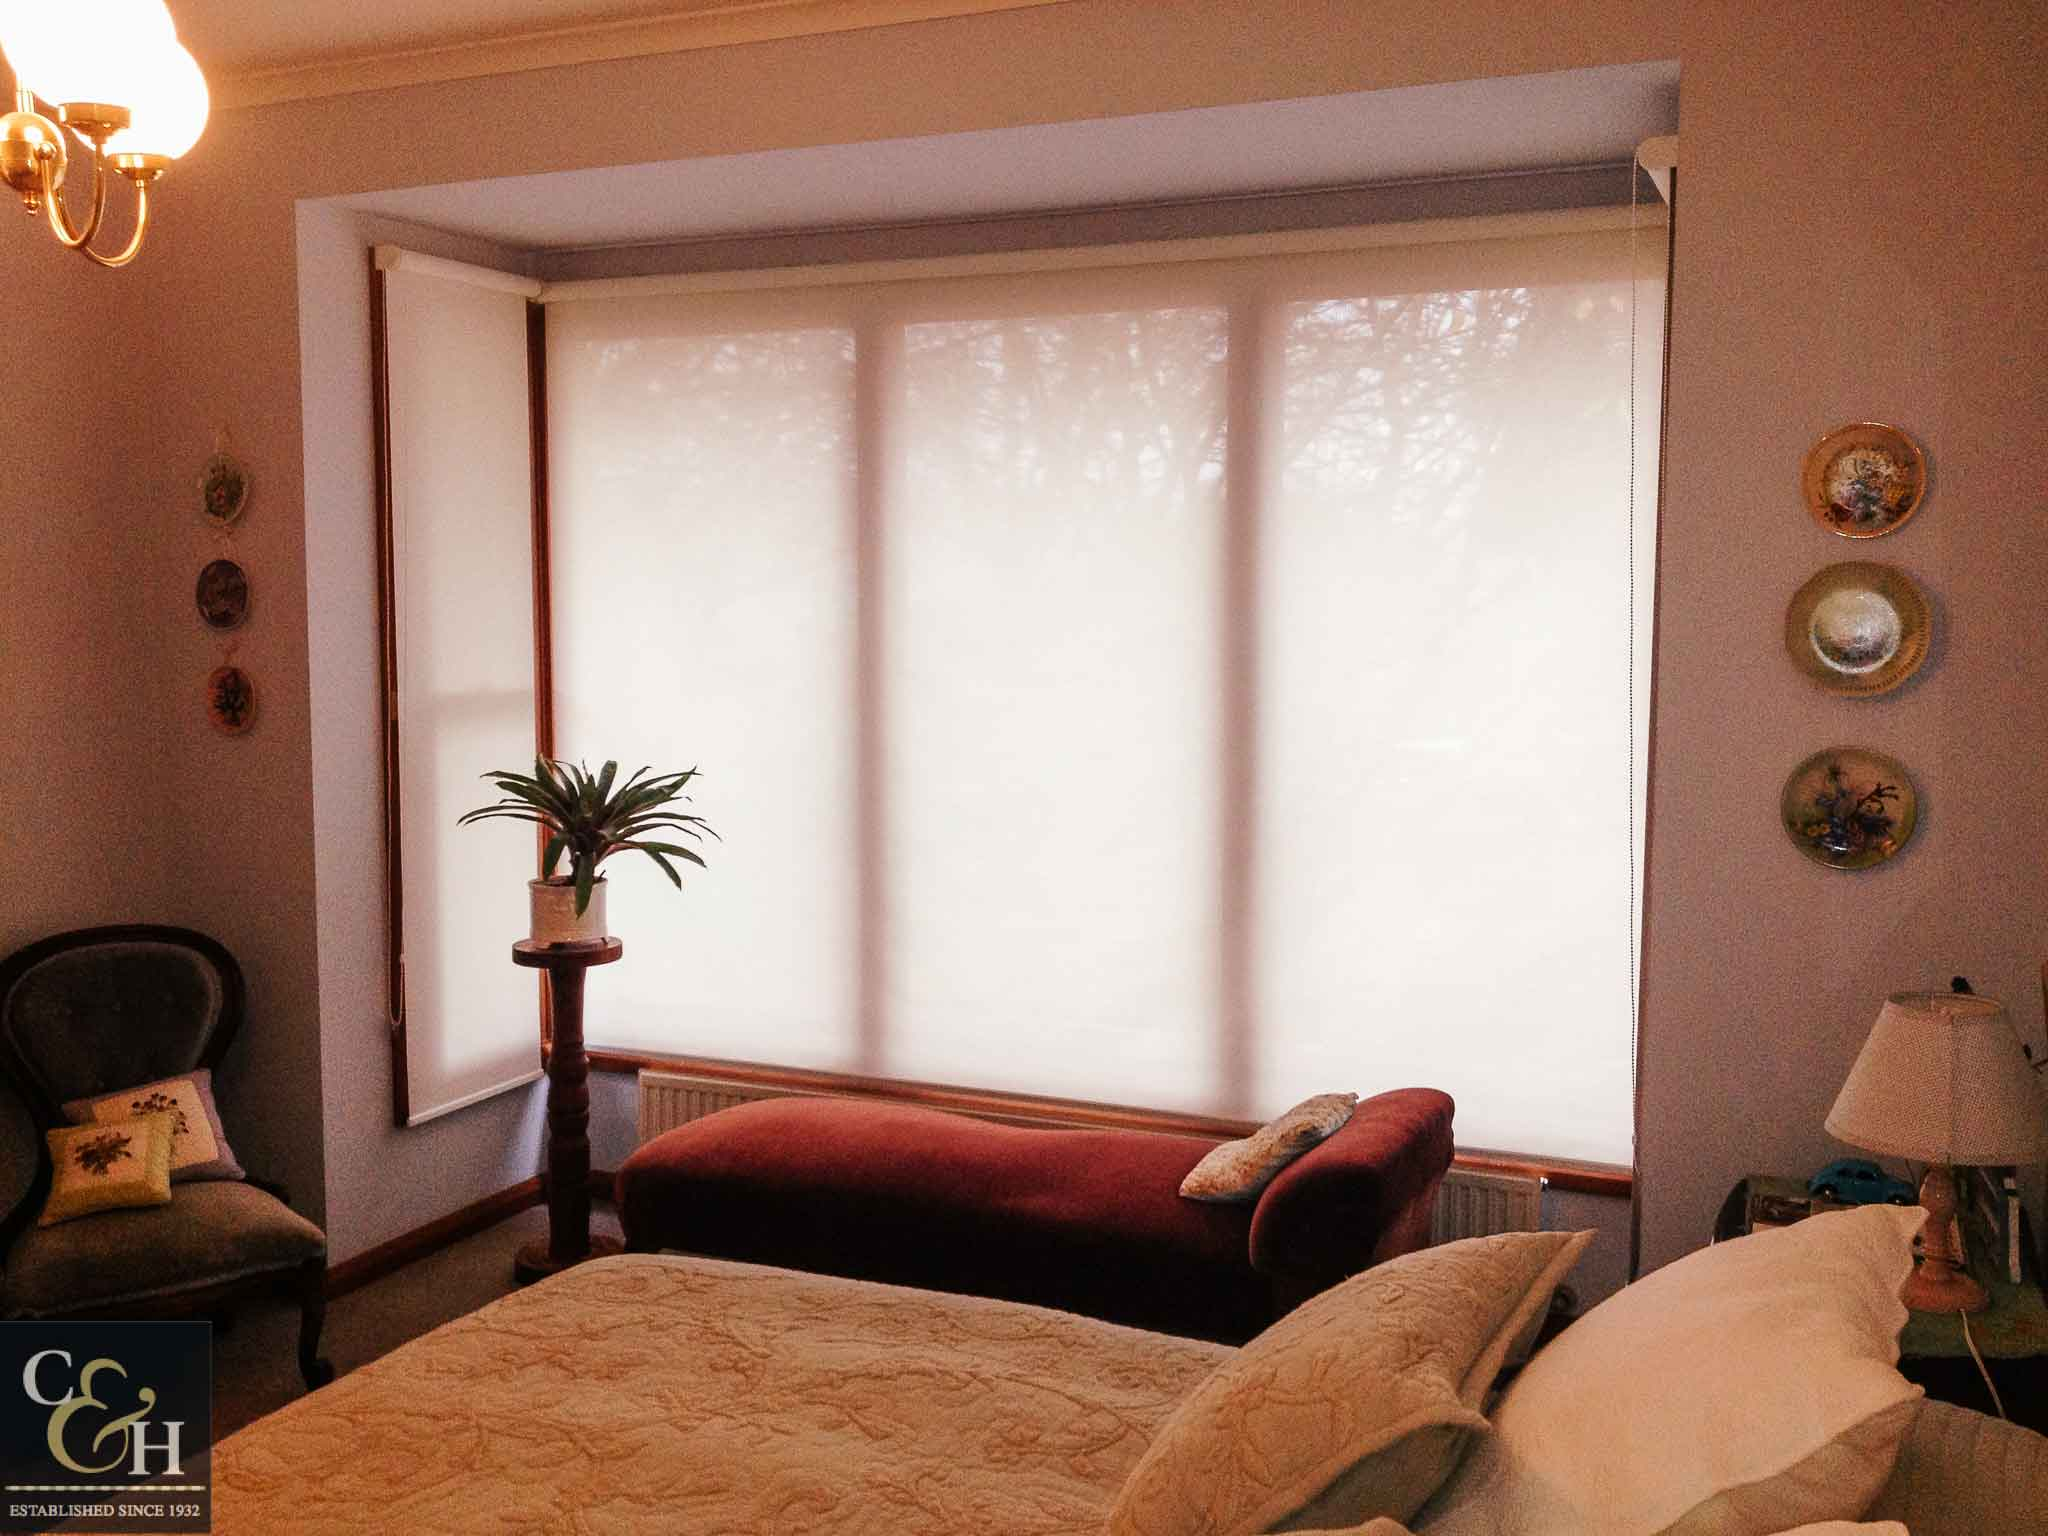 Screen roller blinds 40 inside a bedroom